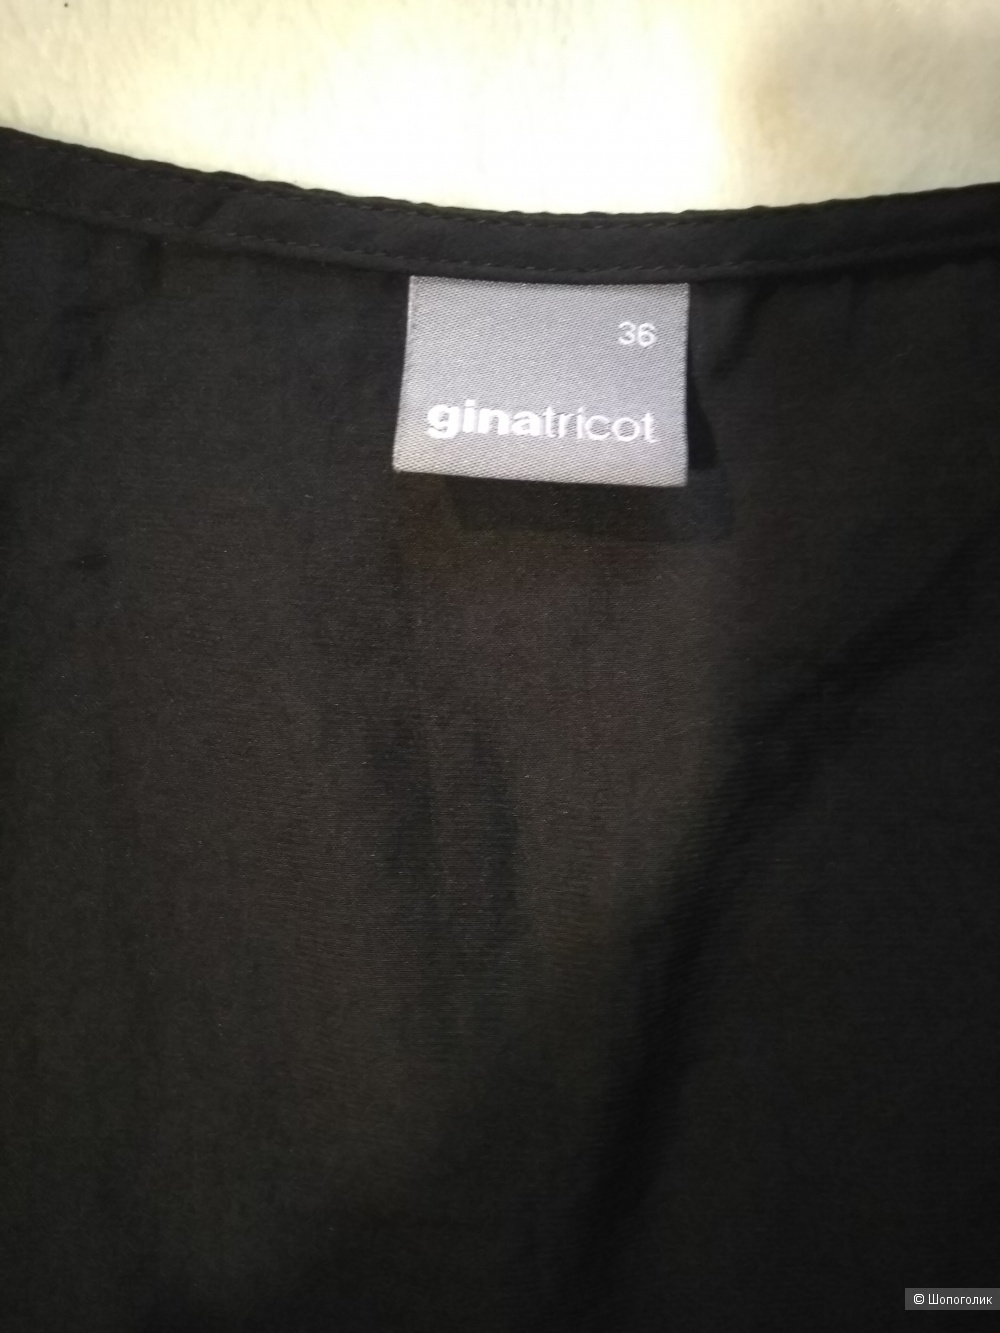 Комплект юбка Concept Club размер XS и топ GINAtricot размер 36